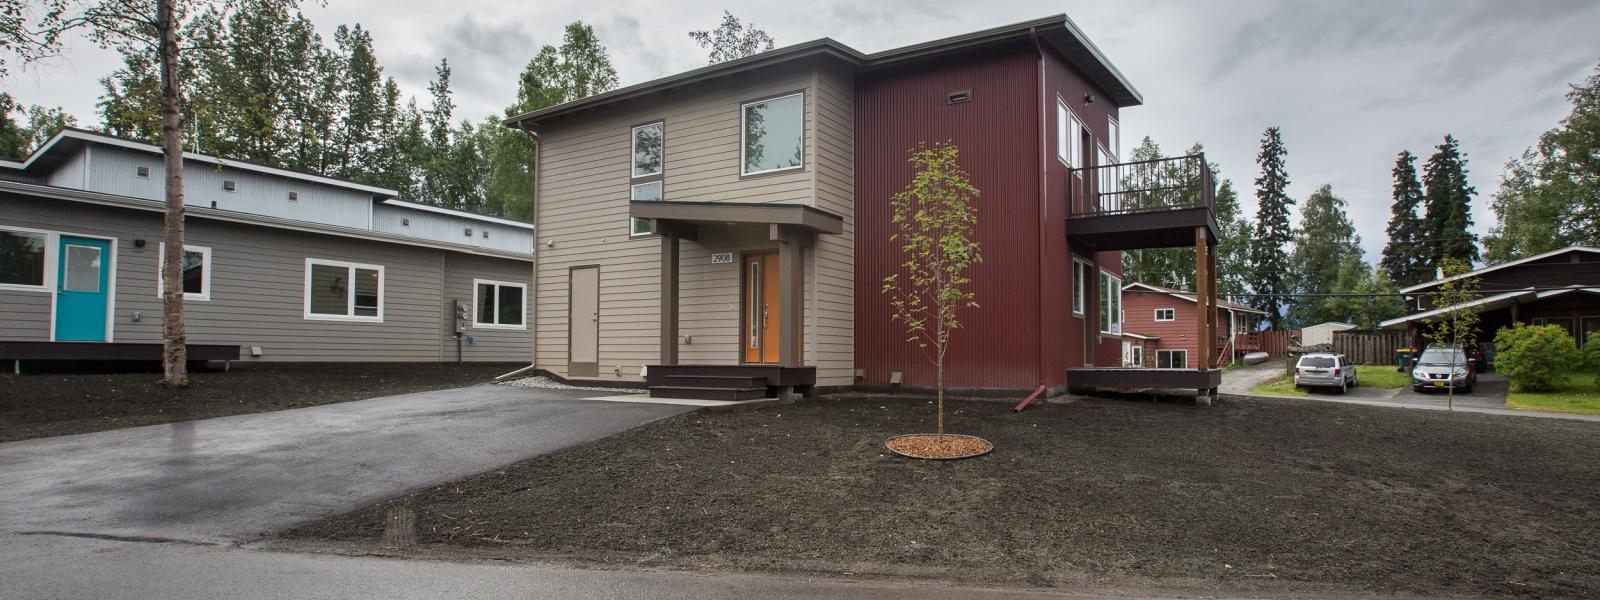 2908 Klamath Drive, Anchorage, 99517, 1 Bedroom Bedrooms, ,1 BathroomBathrooms,Duplex,For Rent,Klamath Drive,1069